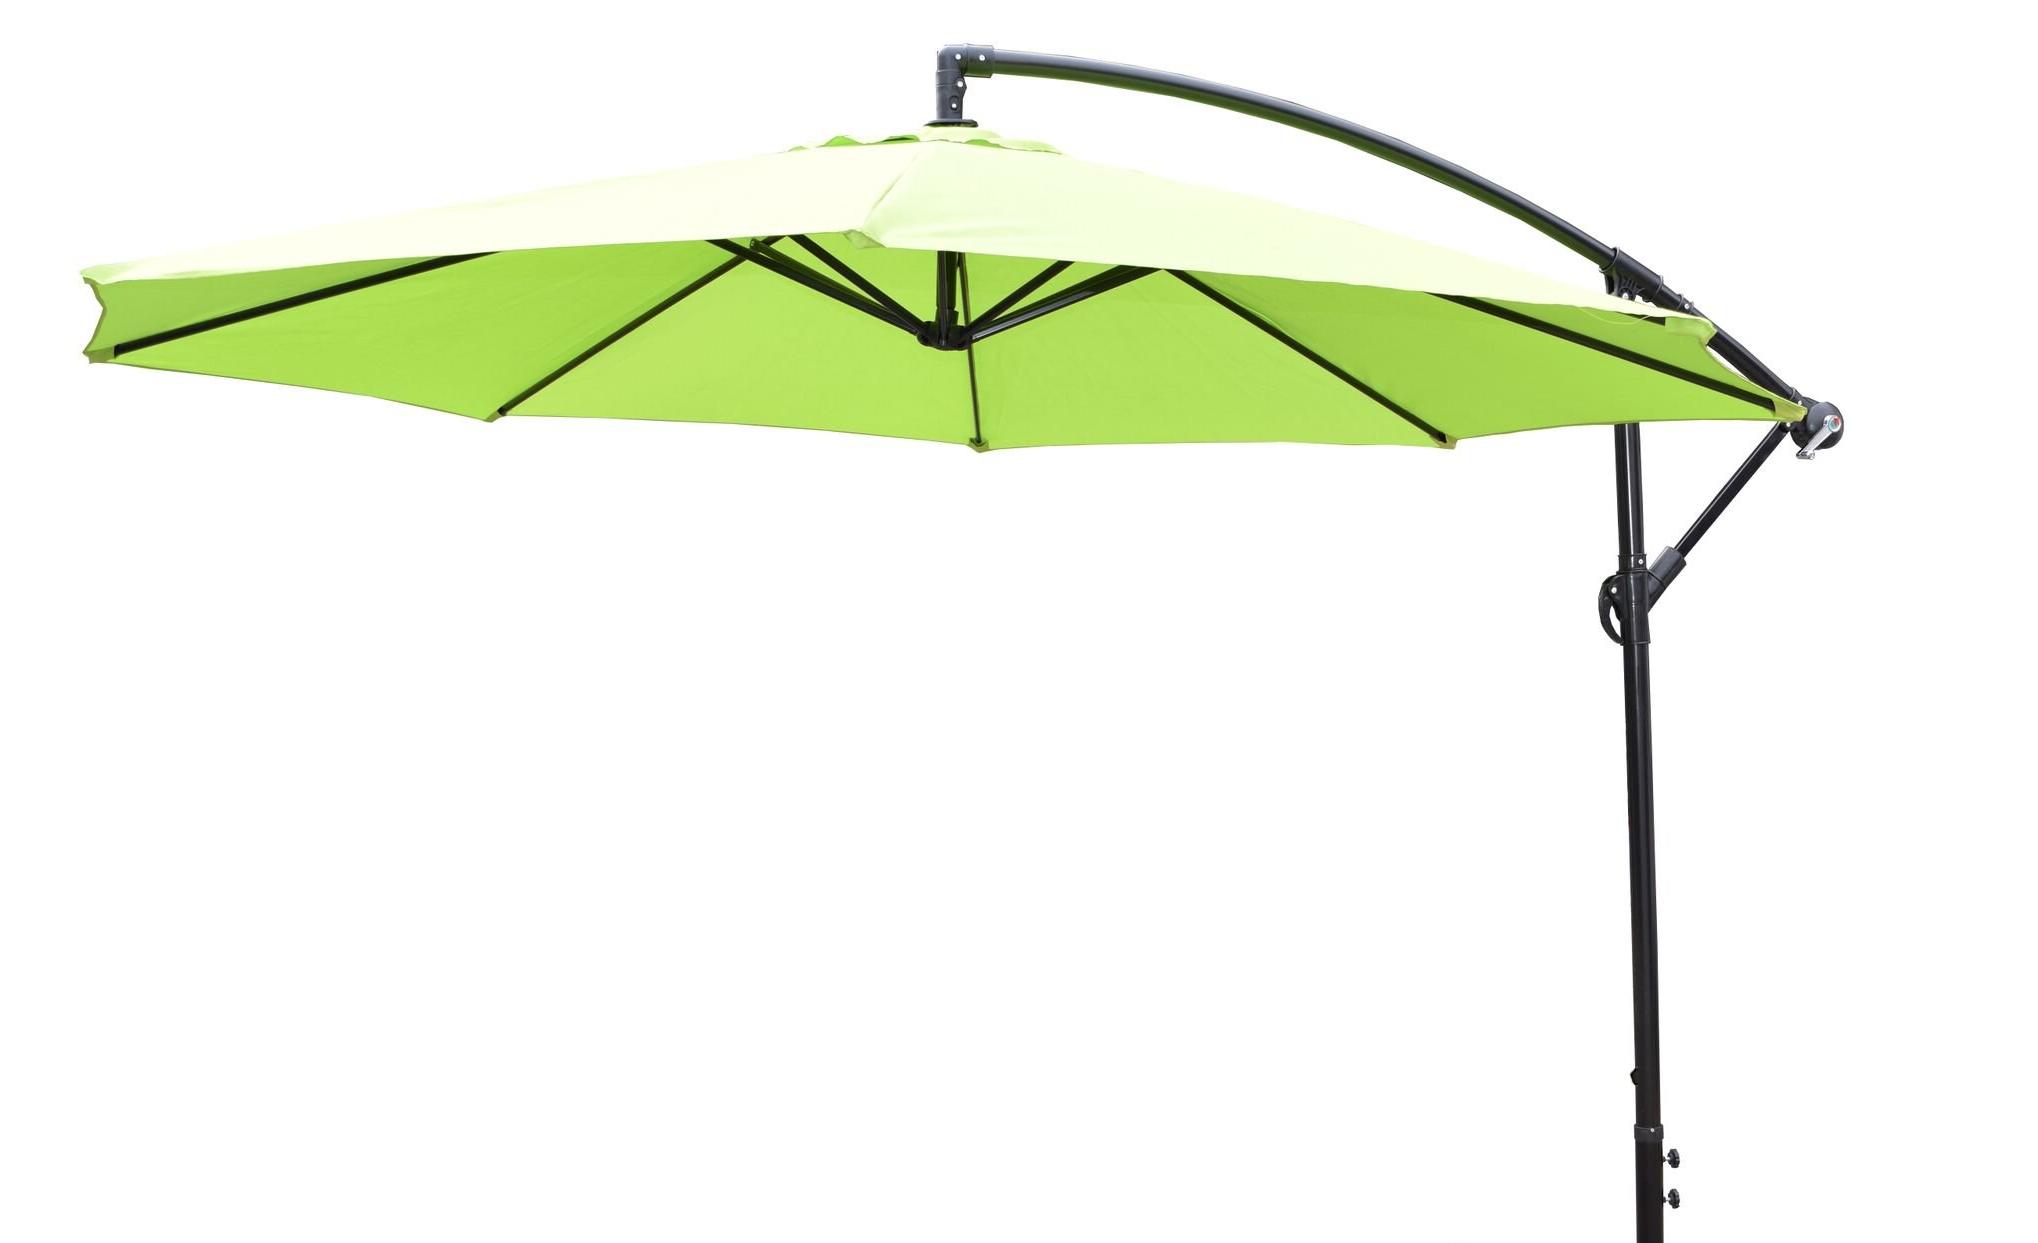 Most Recent Auda 10' Cantilever Umbrella With Olen Cantilever Umbrellas (View 7 of 20)